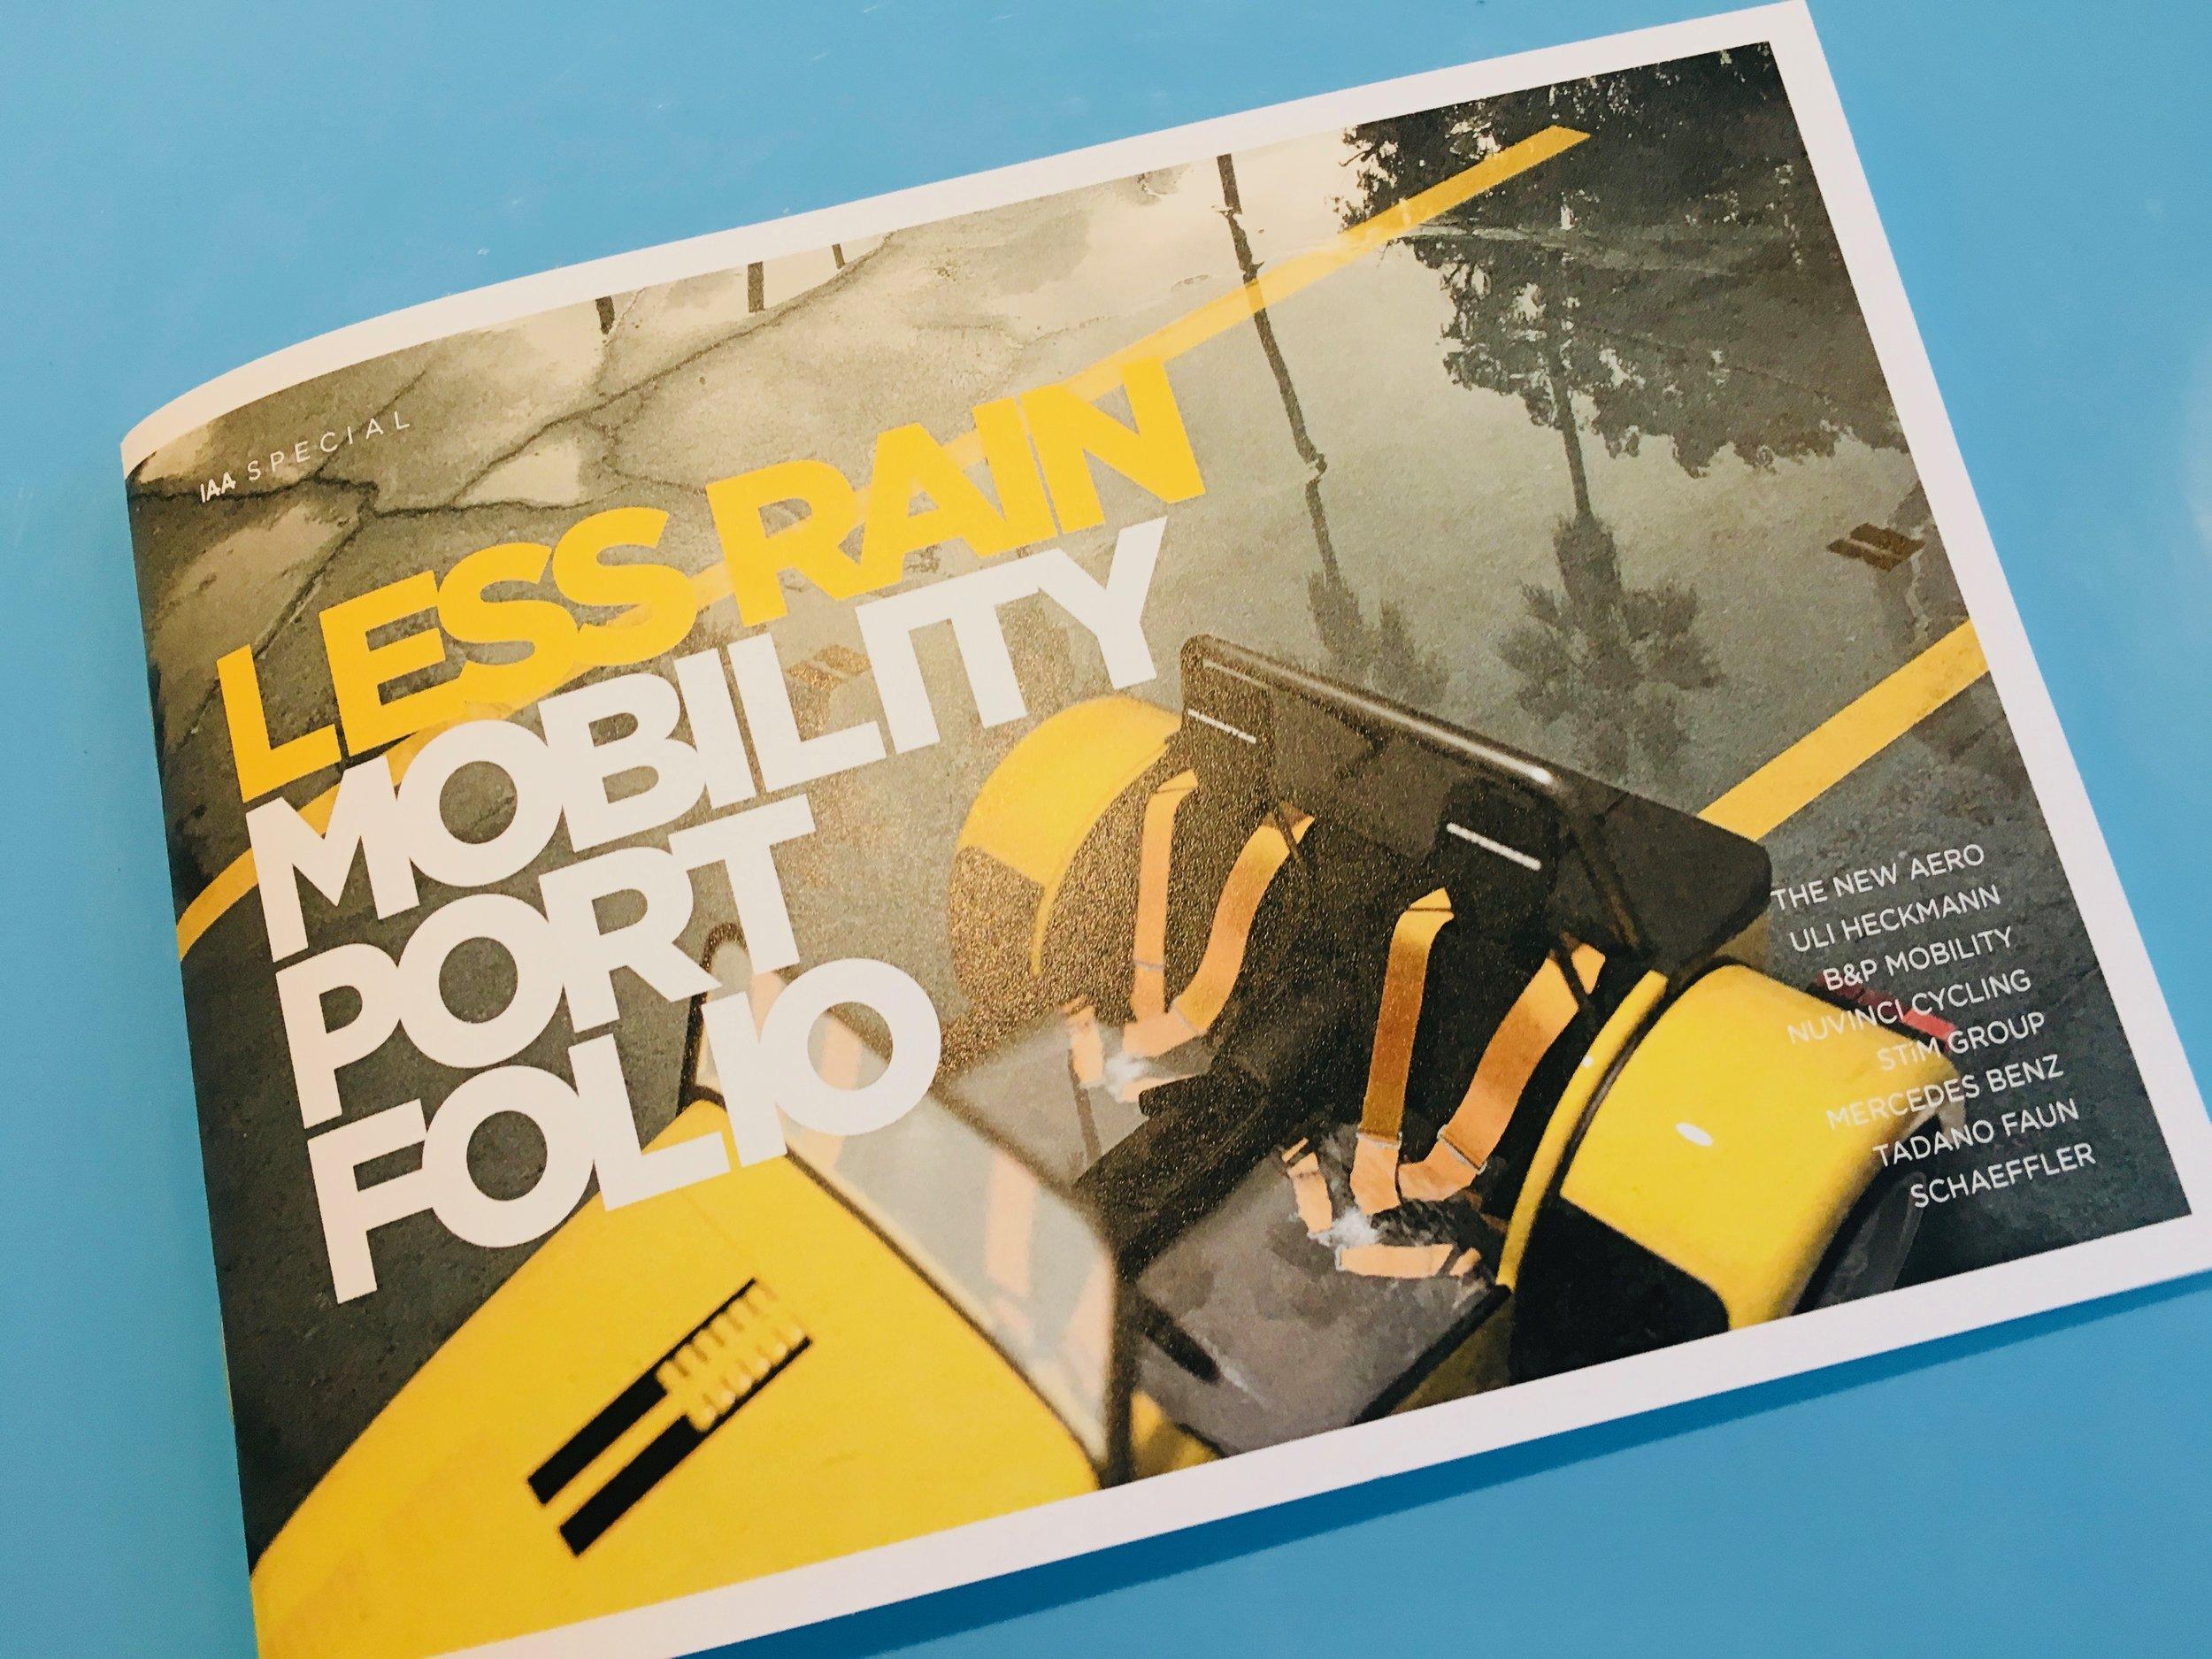 Less Rain Mobility